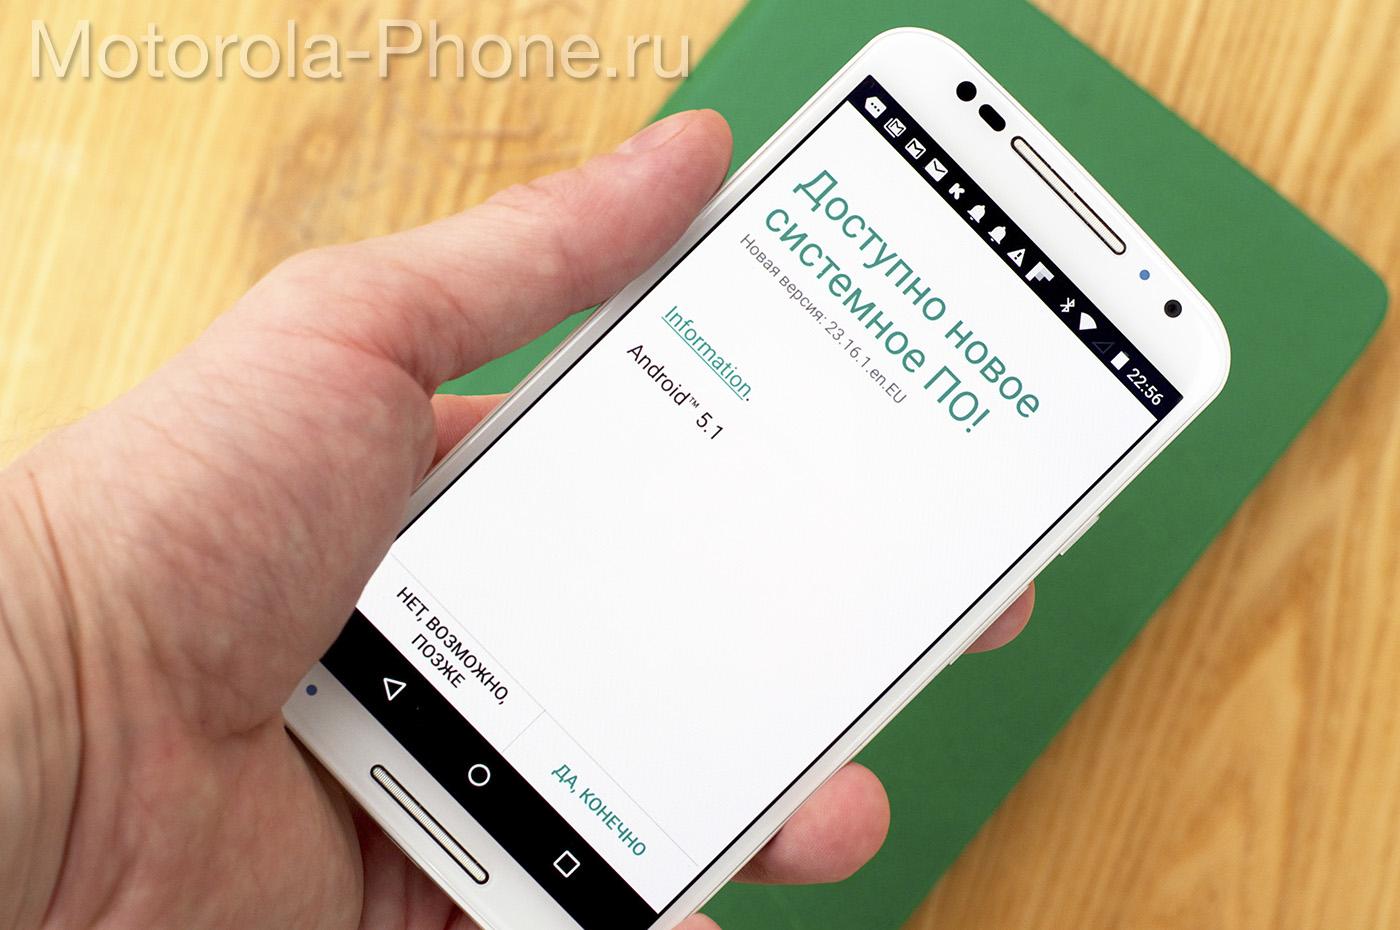 Motorola-Moto-X-2014-Android-5-1-02